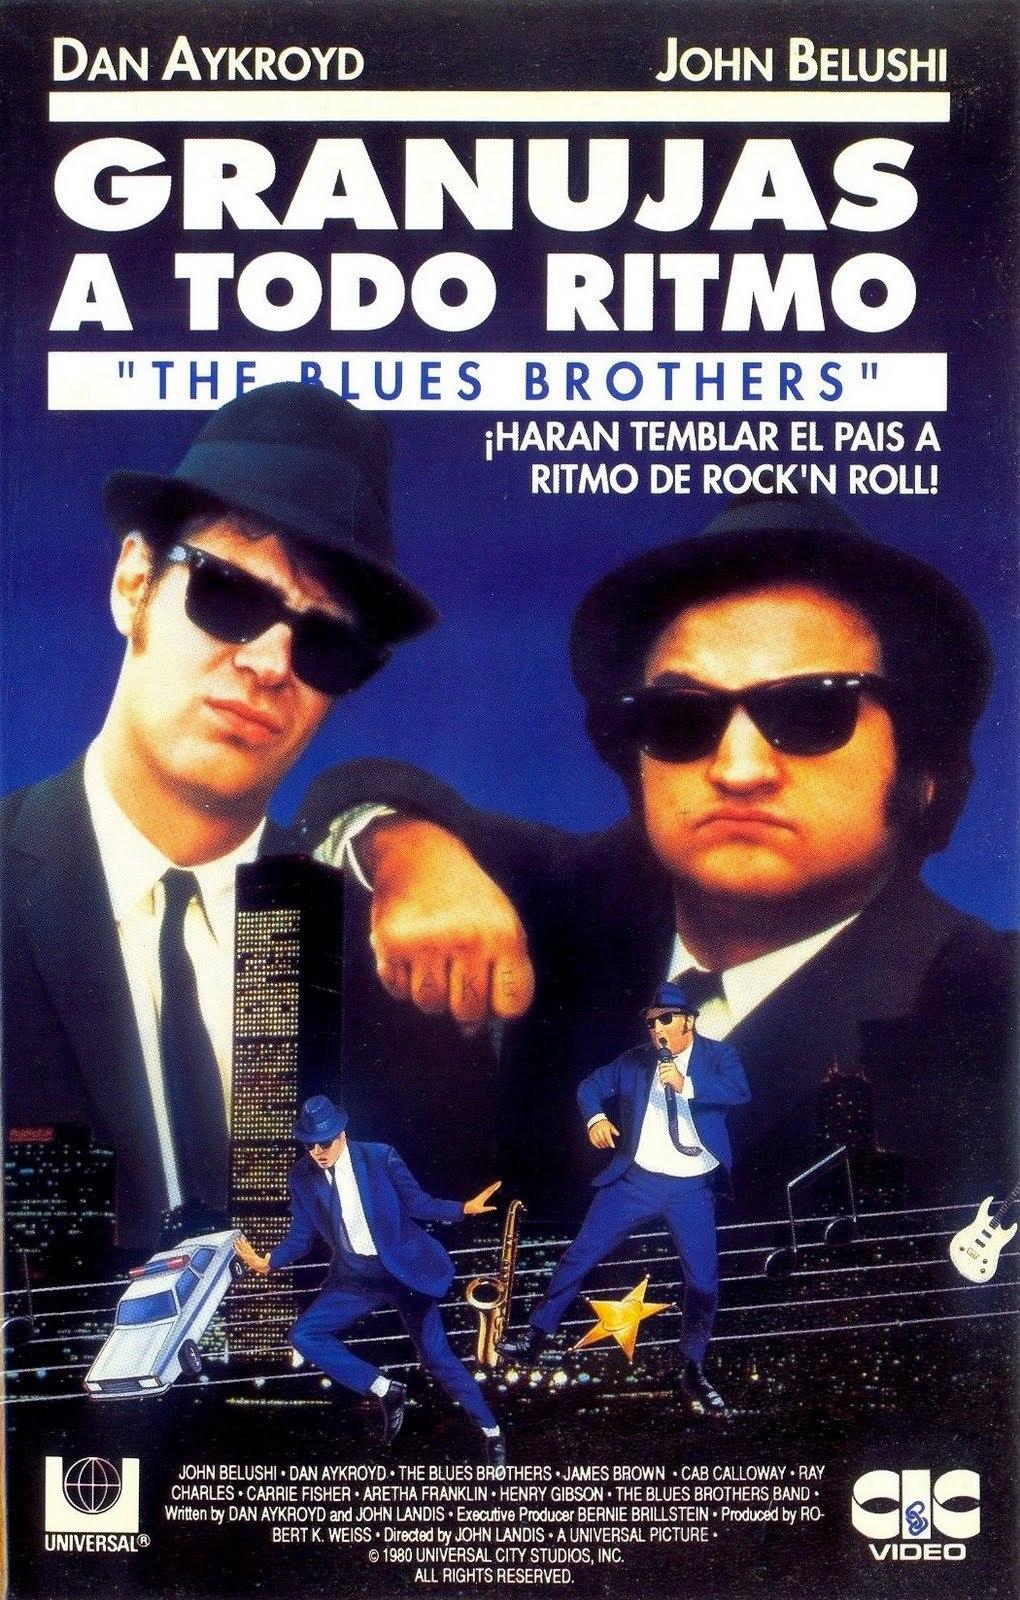 Cartel de Granujas a todo ritmo (The Blues Brothers)